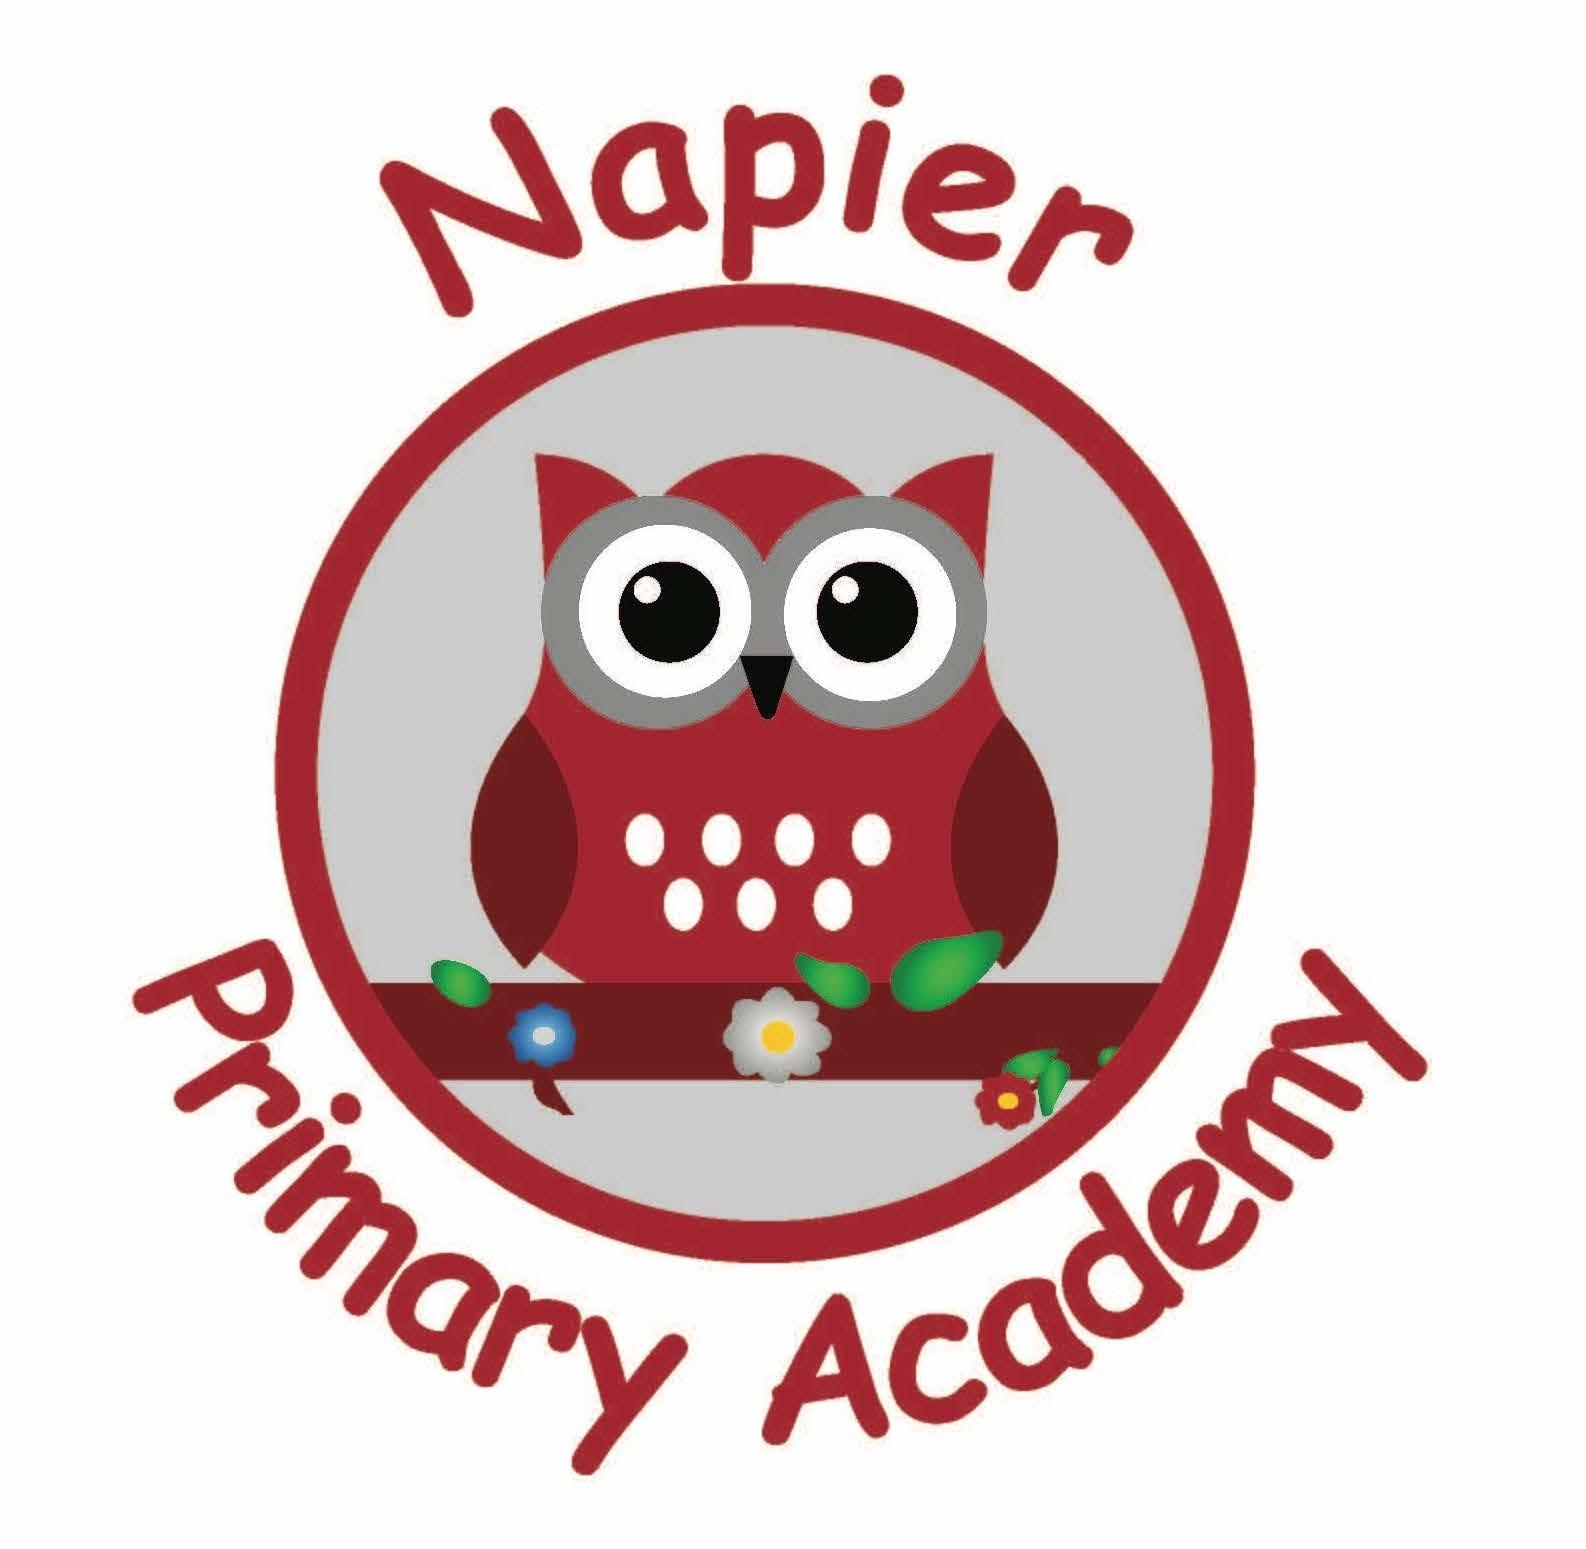 Napier Community Primary and Nursery Academy